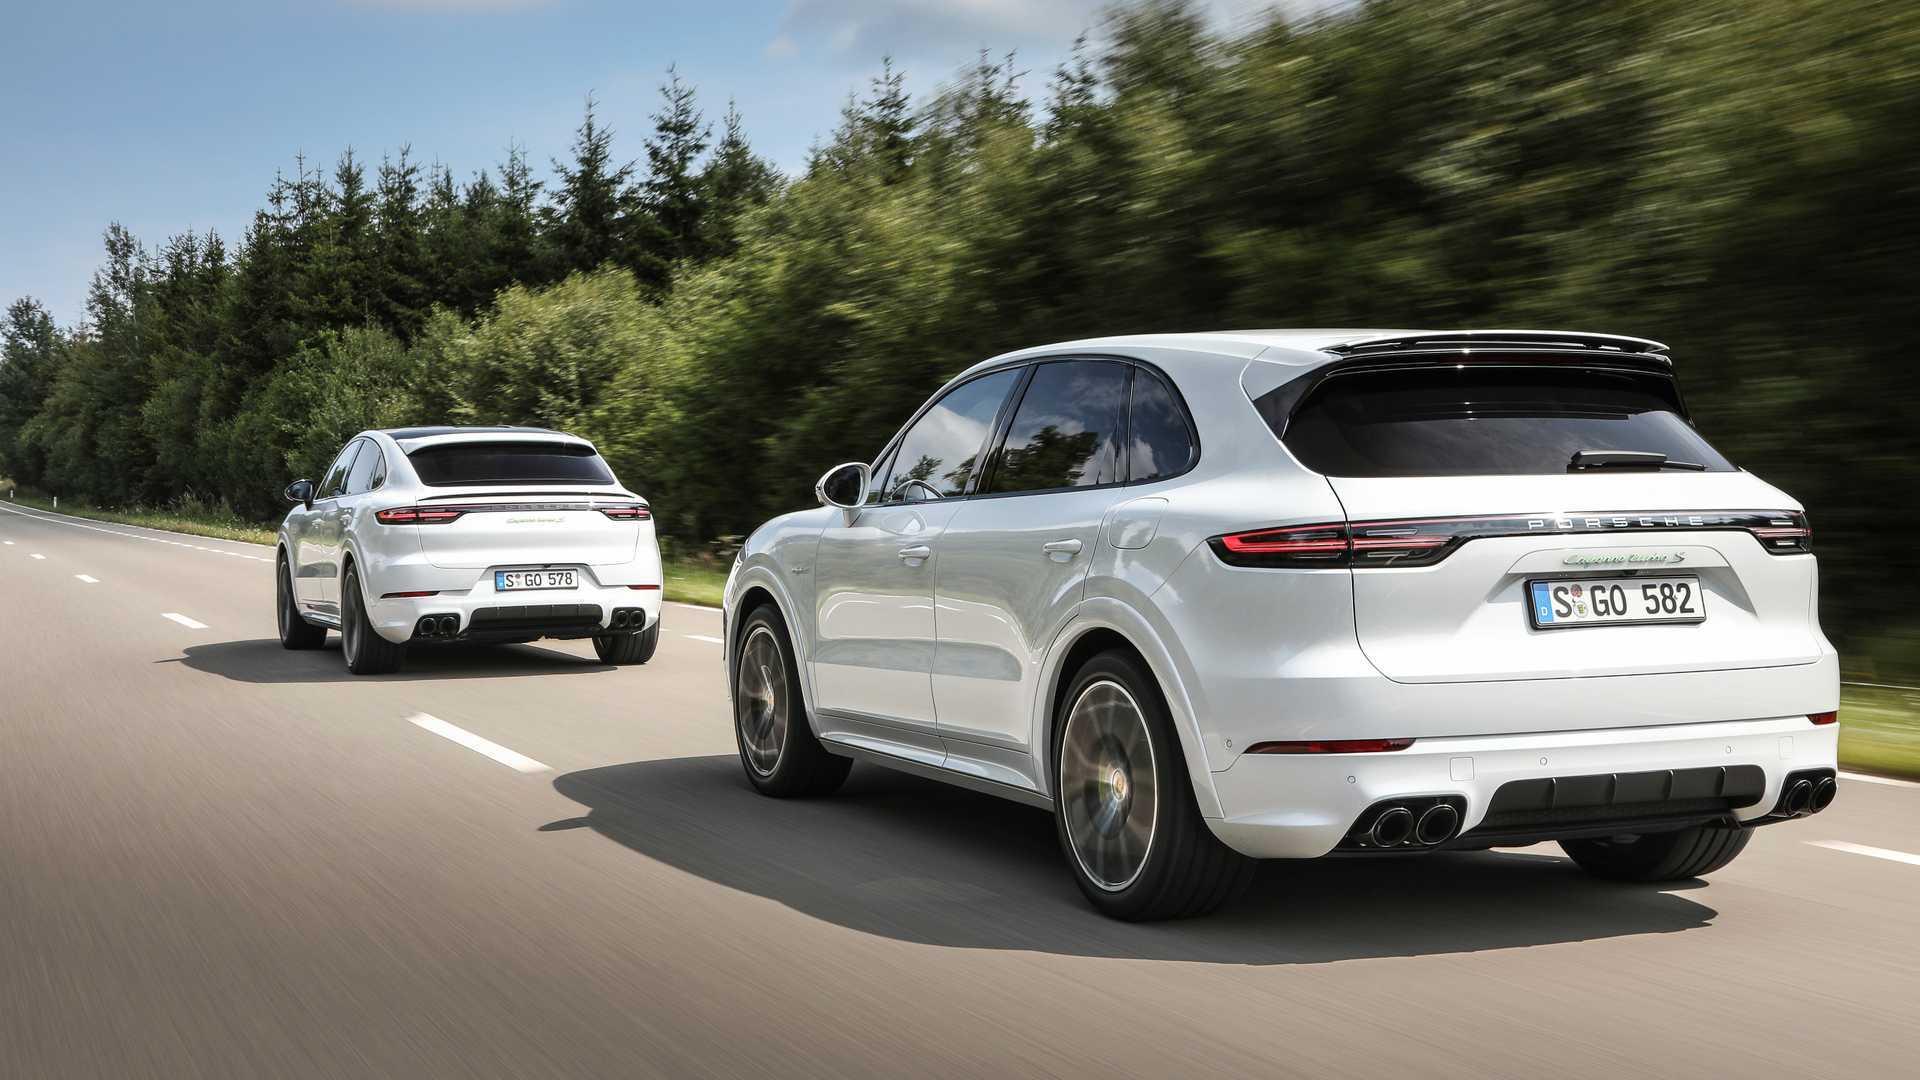 Porsche Adds Trio Of Hybrids To 2020 Cayenne Model Line